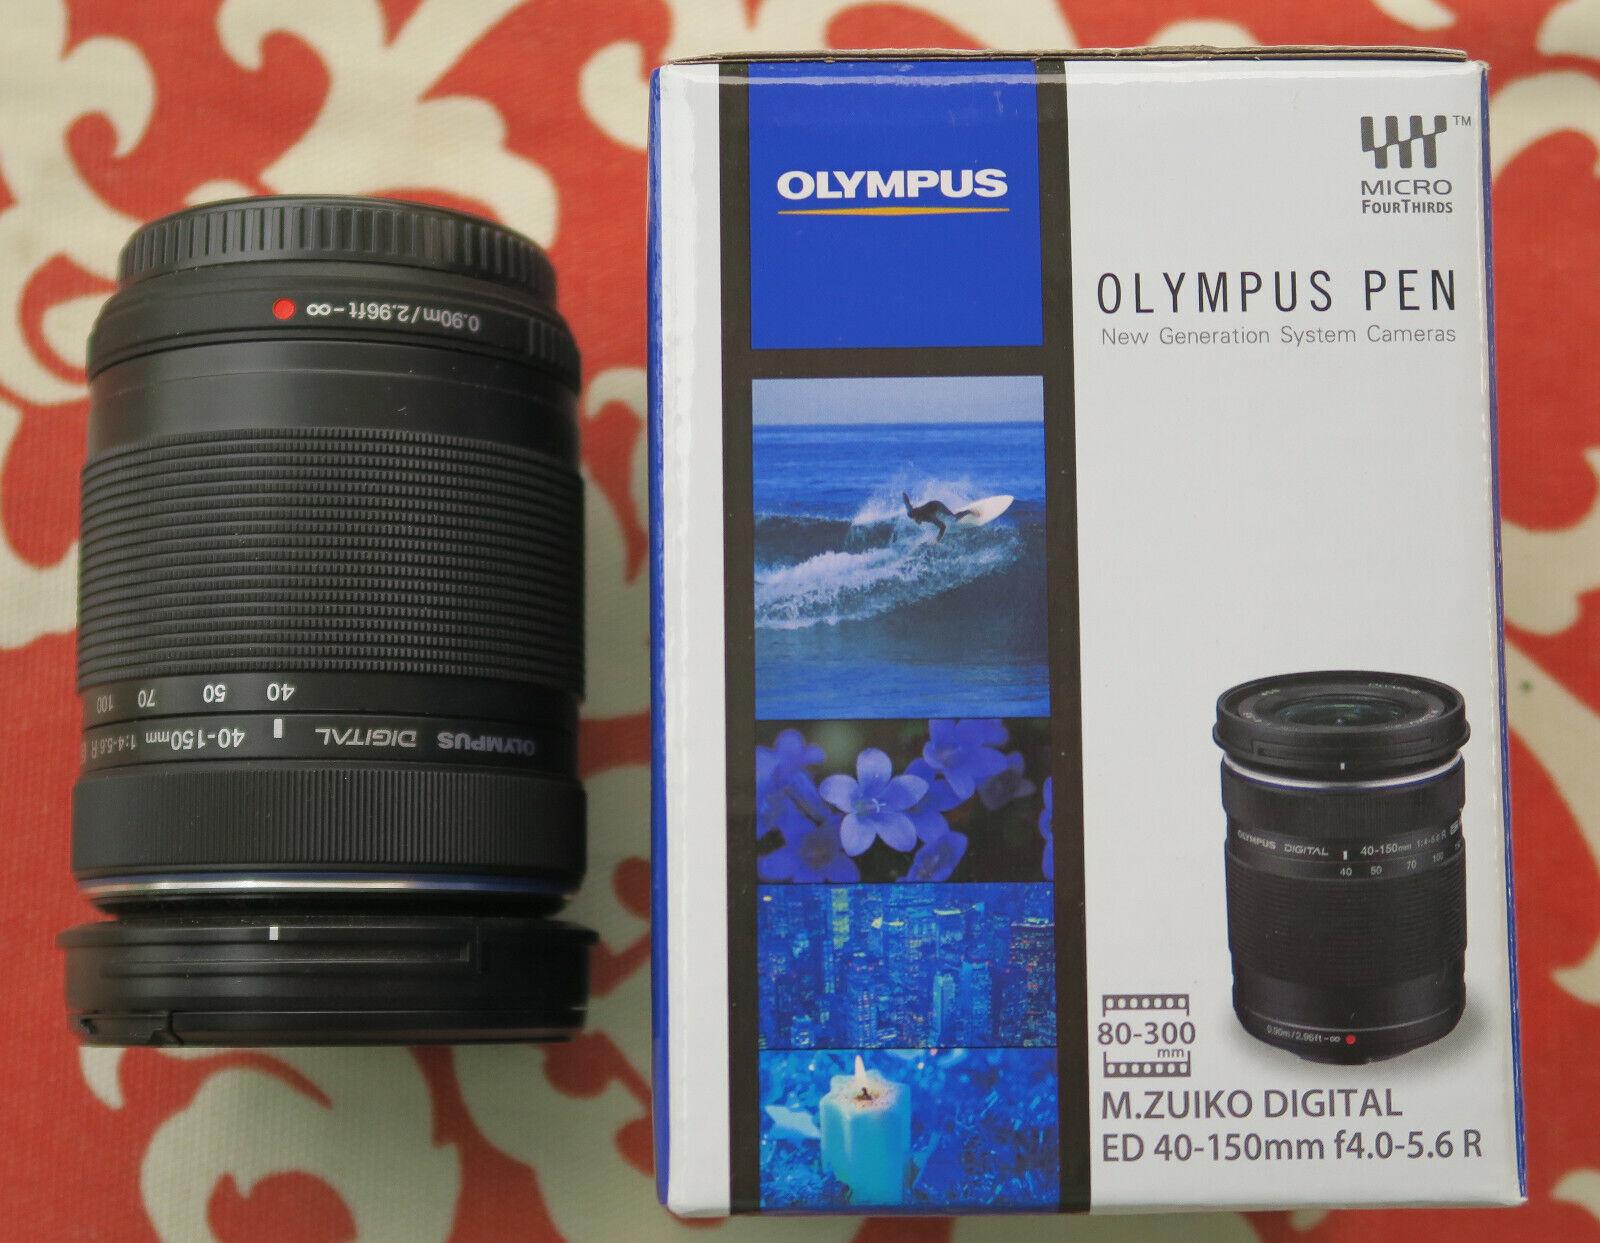 Olympus M.Zuiko 40-150mm F/4.0-5.6 Zoom Lens - Black Micro 4/3 - $53.00